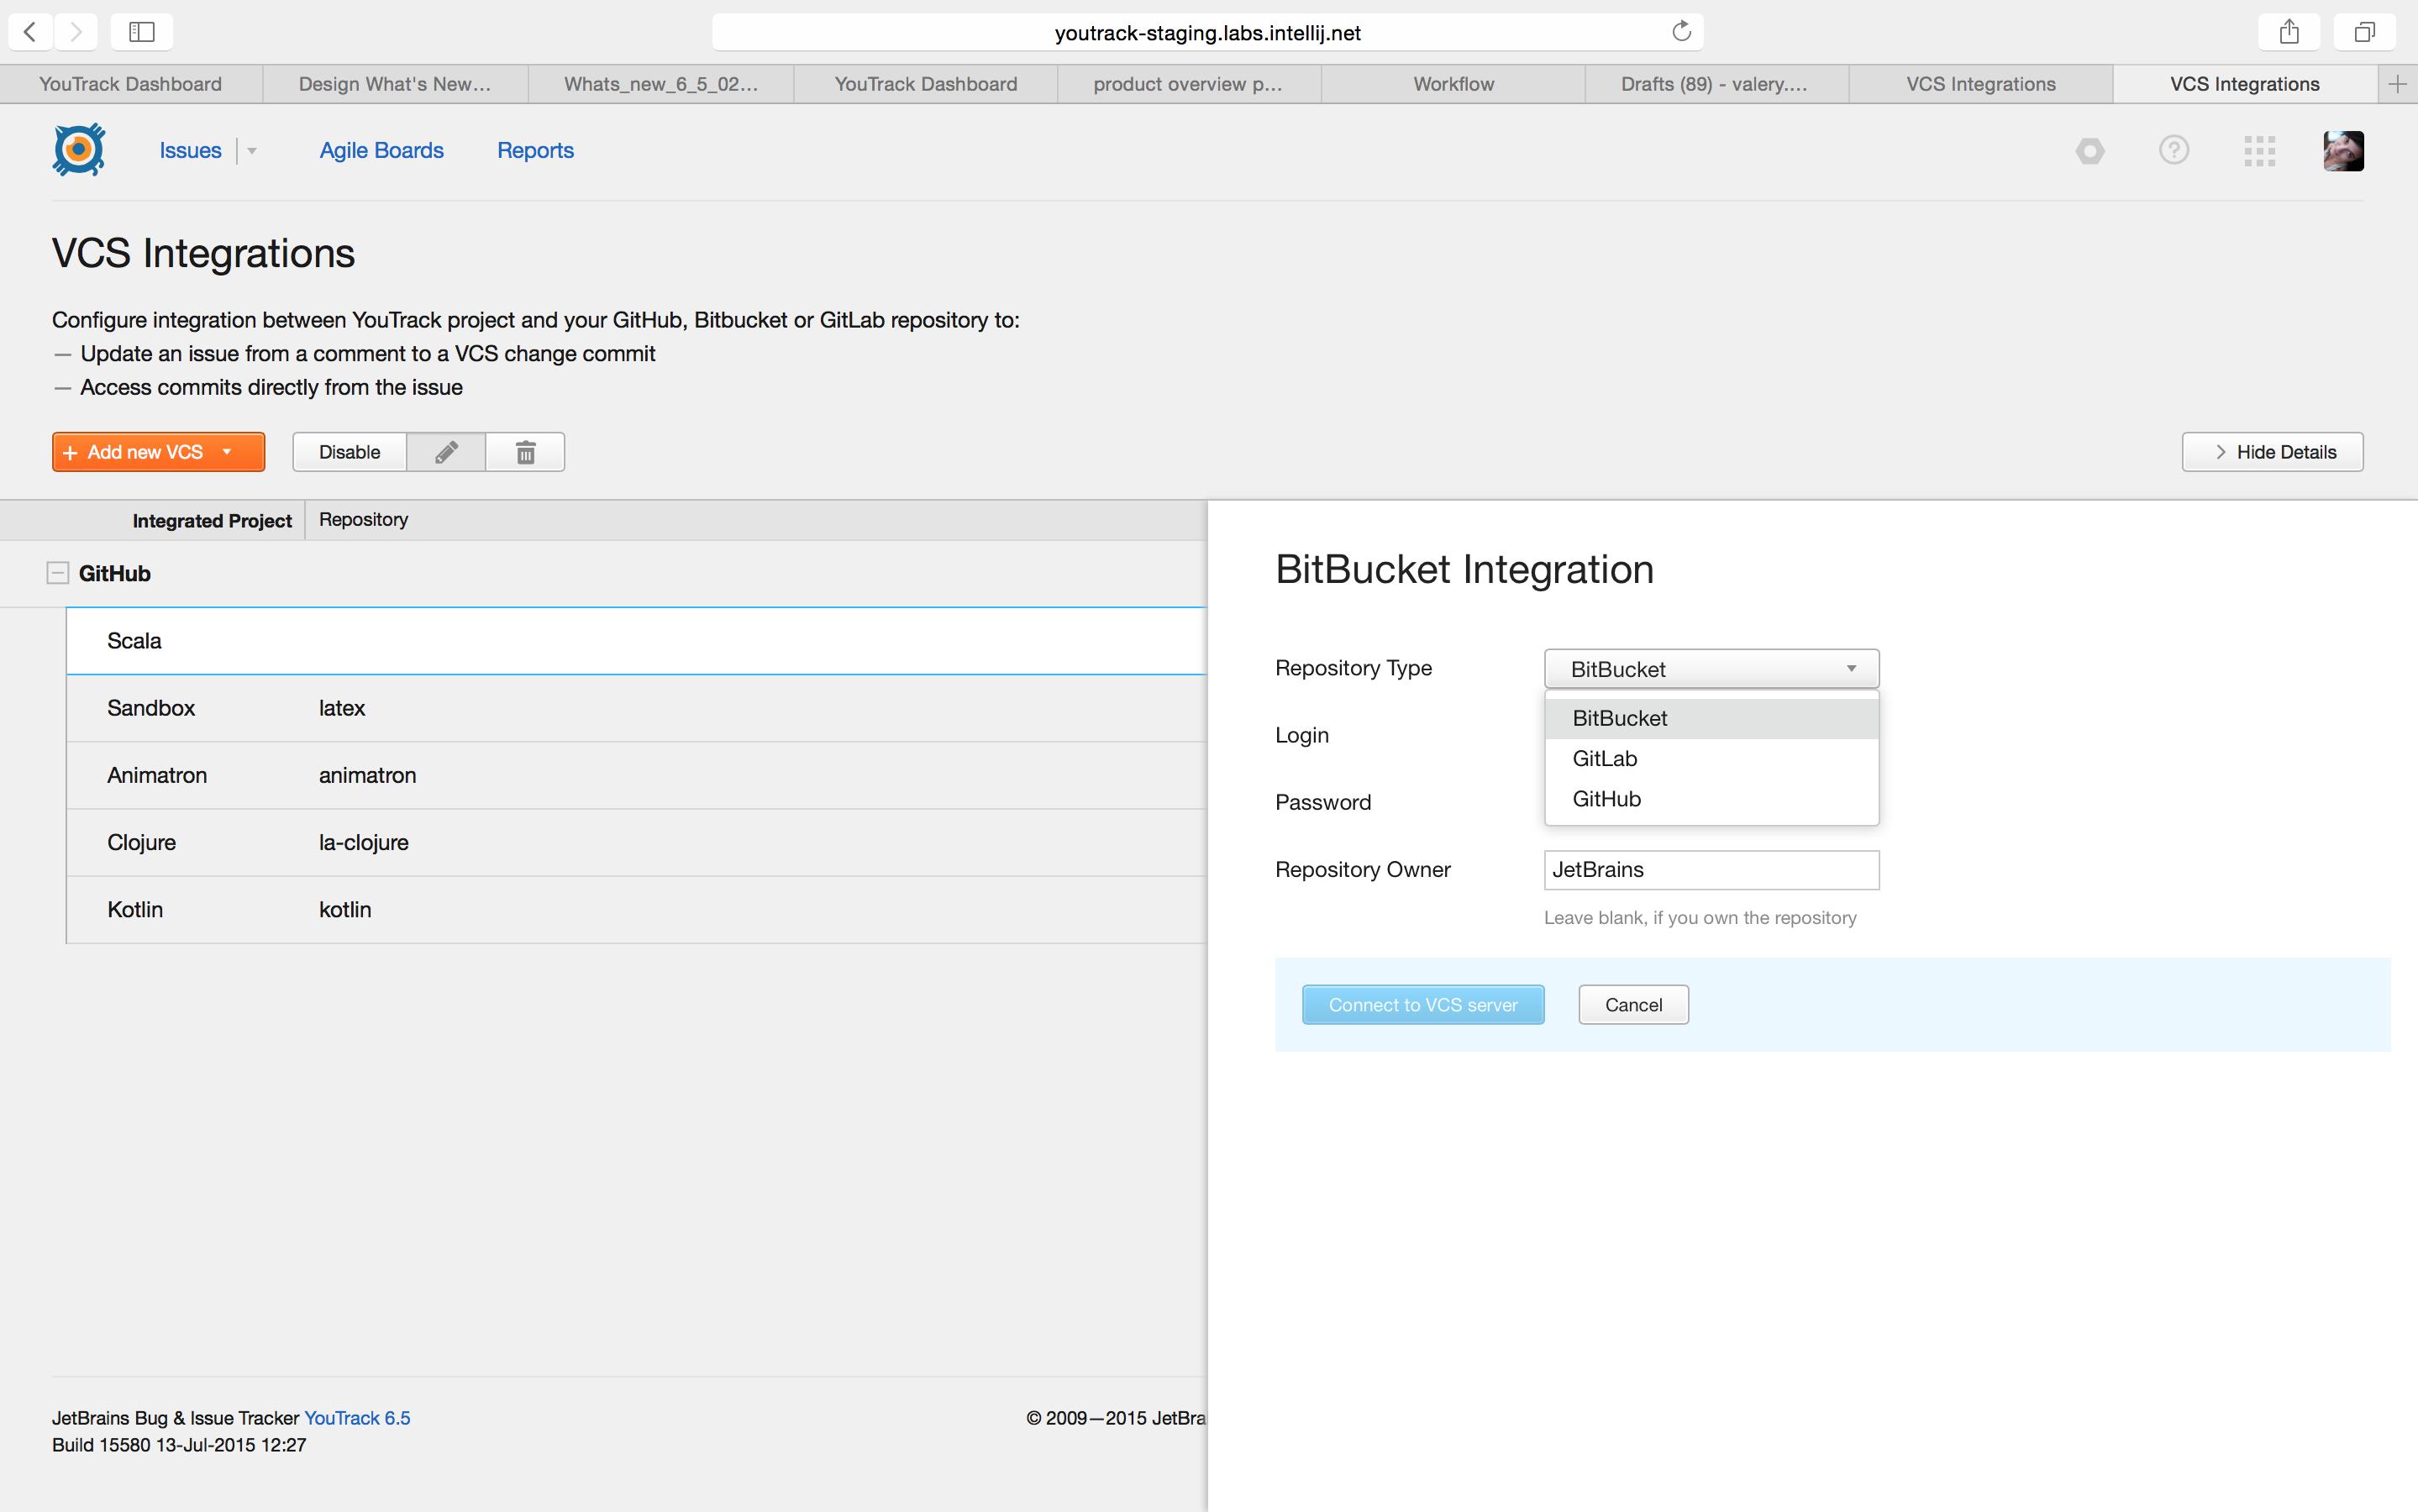 Administration_VCS+integration